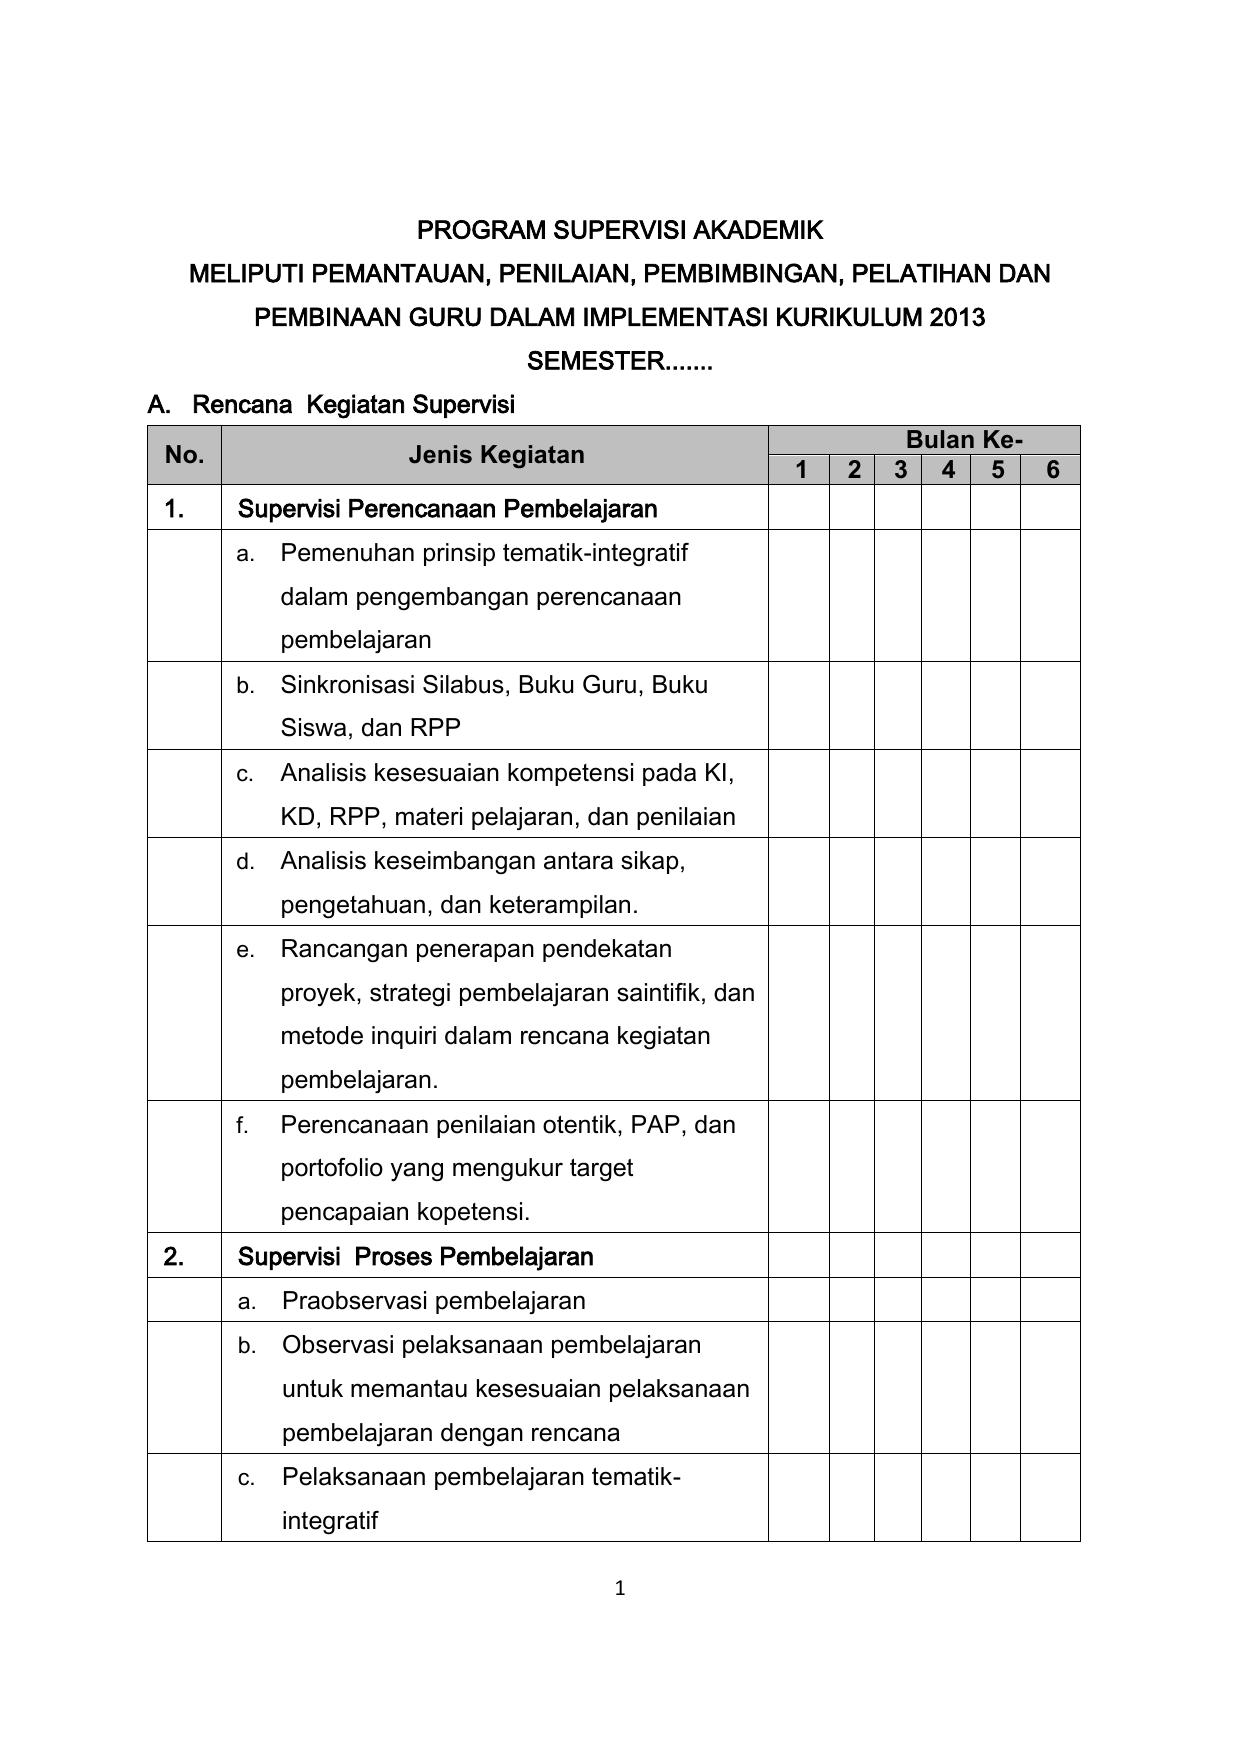 Format Supervisi Guru : format, supervisi, PROGRAM, SUPERVISI, AKADEMIK, MELIPUTI, PEMANTAUAN